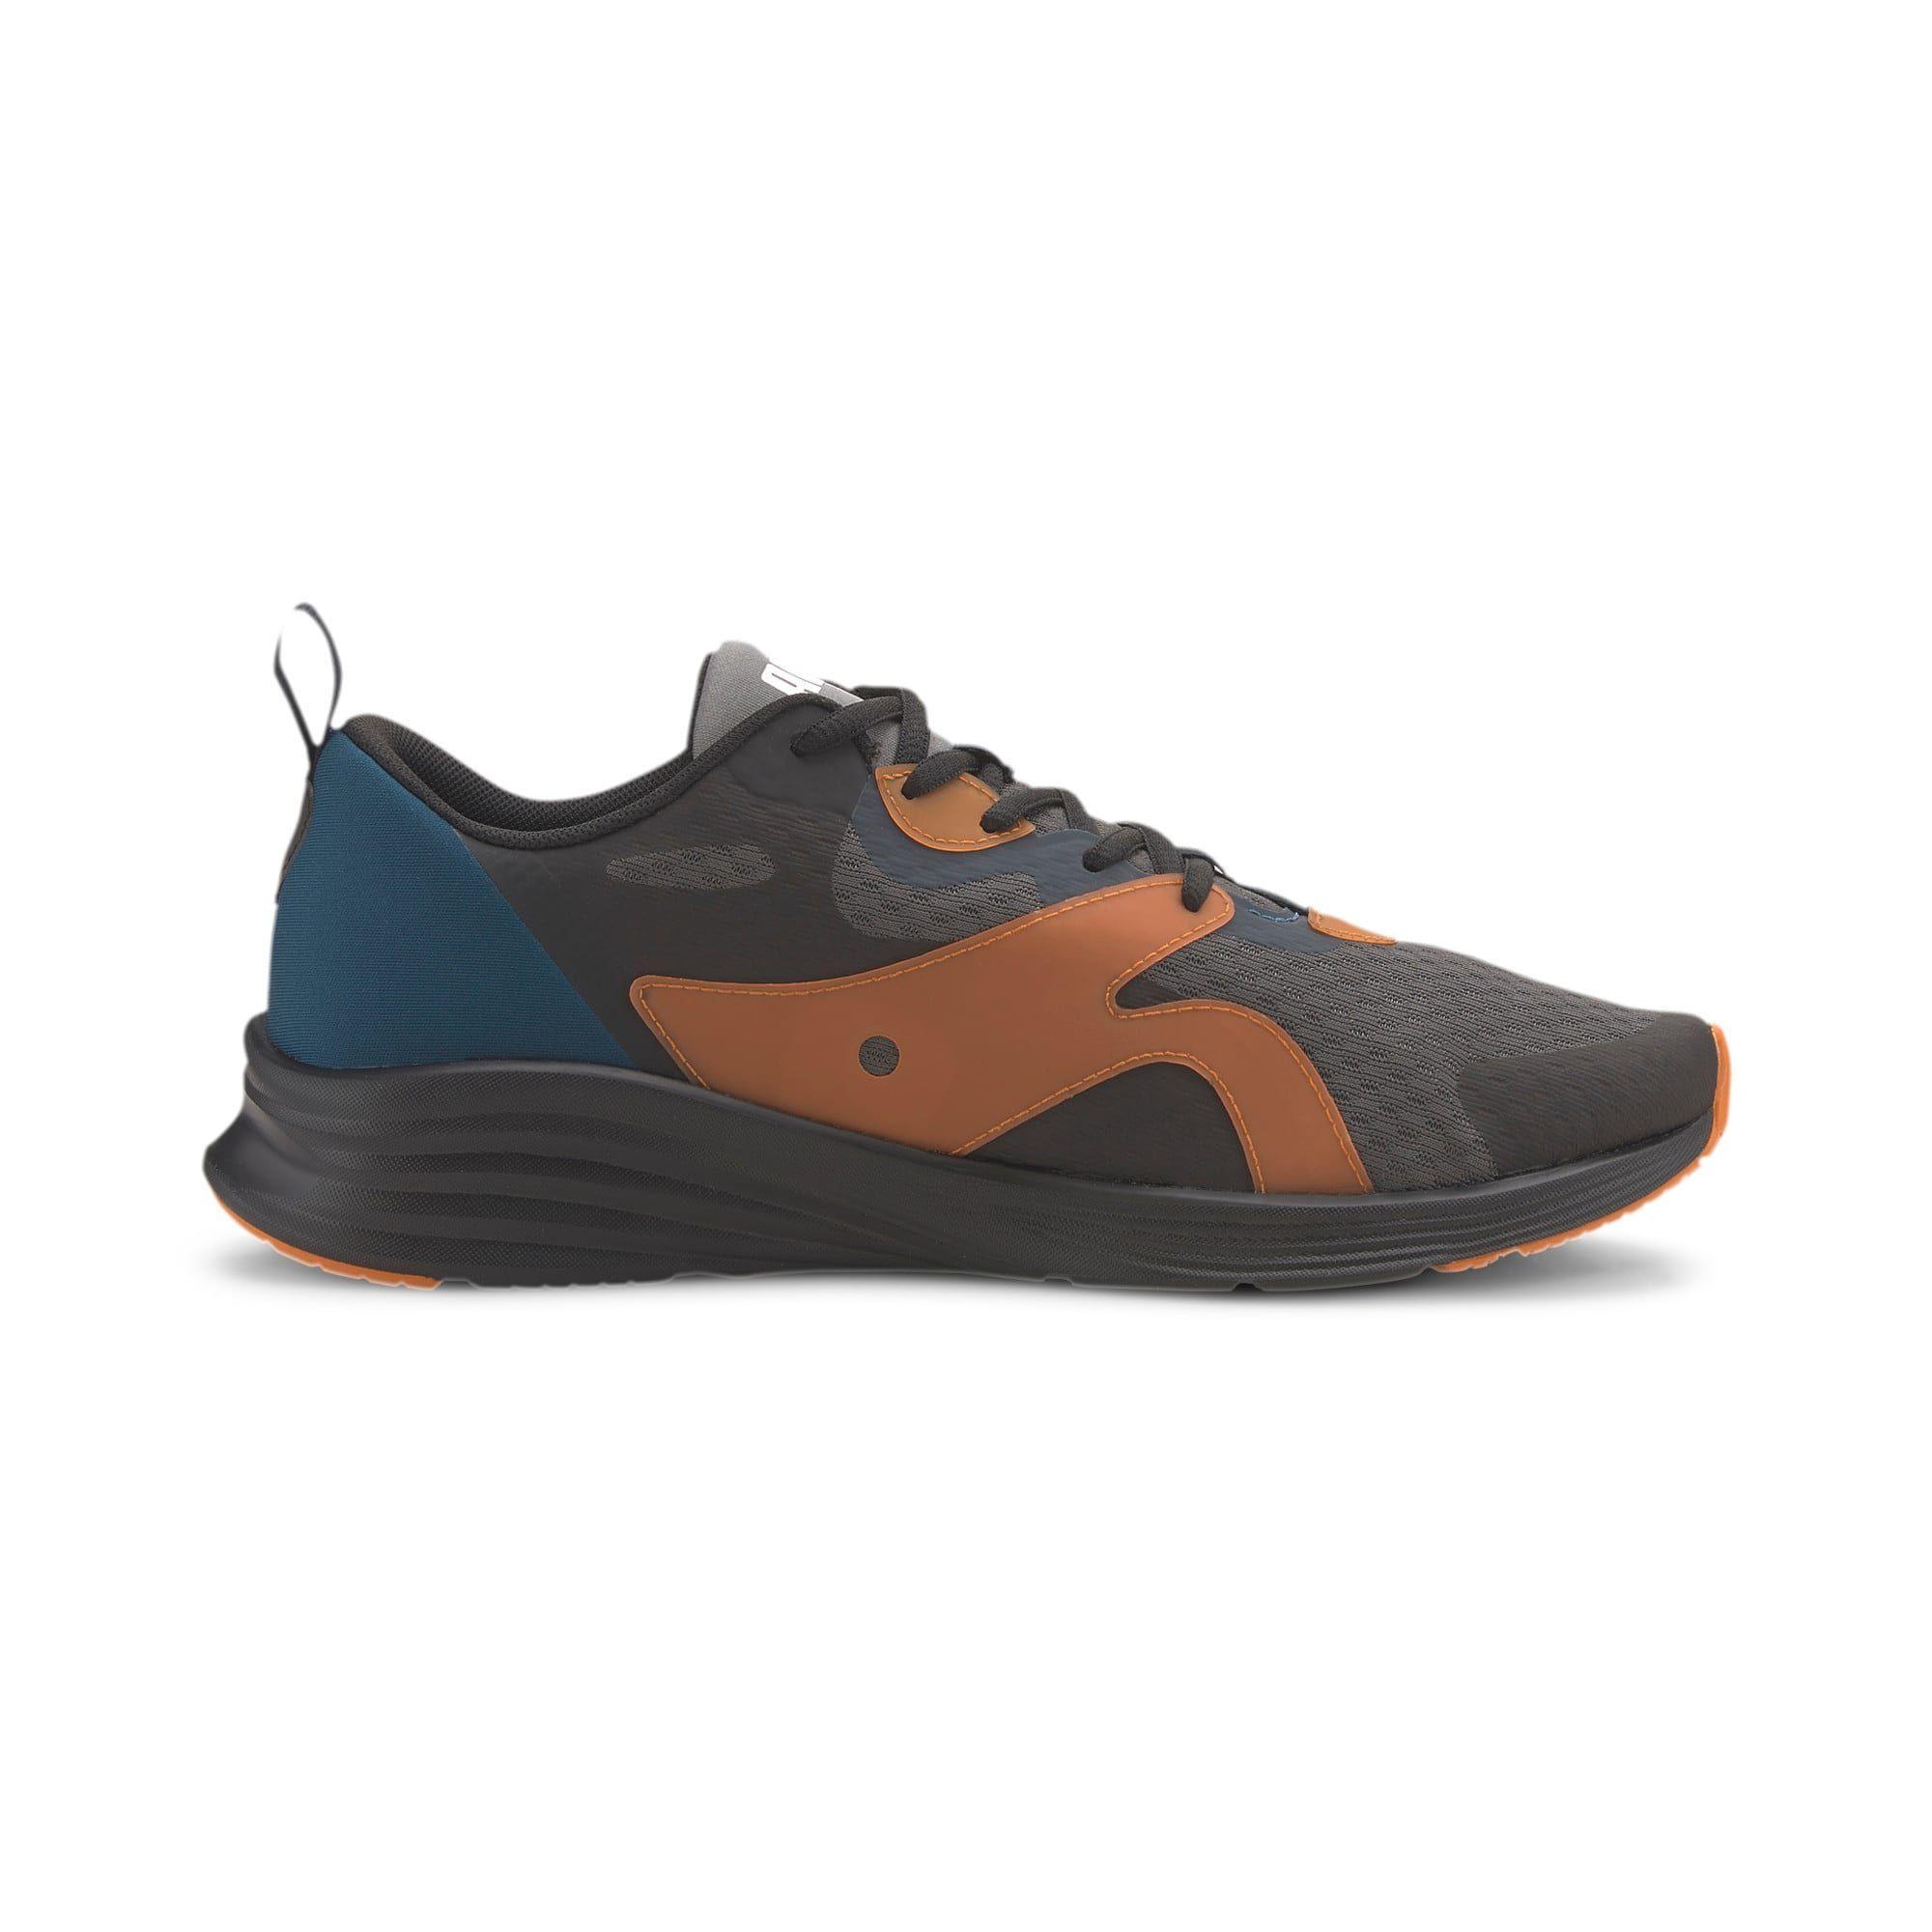 Puma Chaussure Basket Hybrid Fuego Running Pour Homme Orange Taille 40 Chaussures In 2020 Running Shoes For Men Running Shoes Running Sneakers